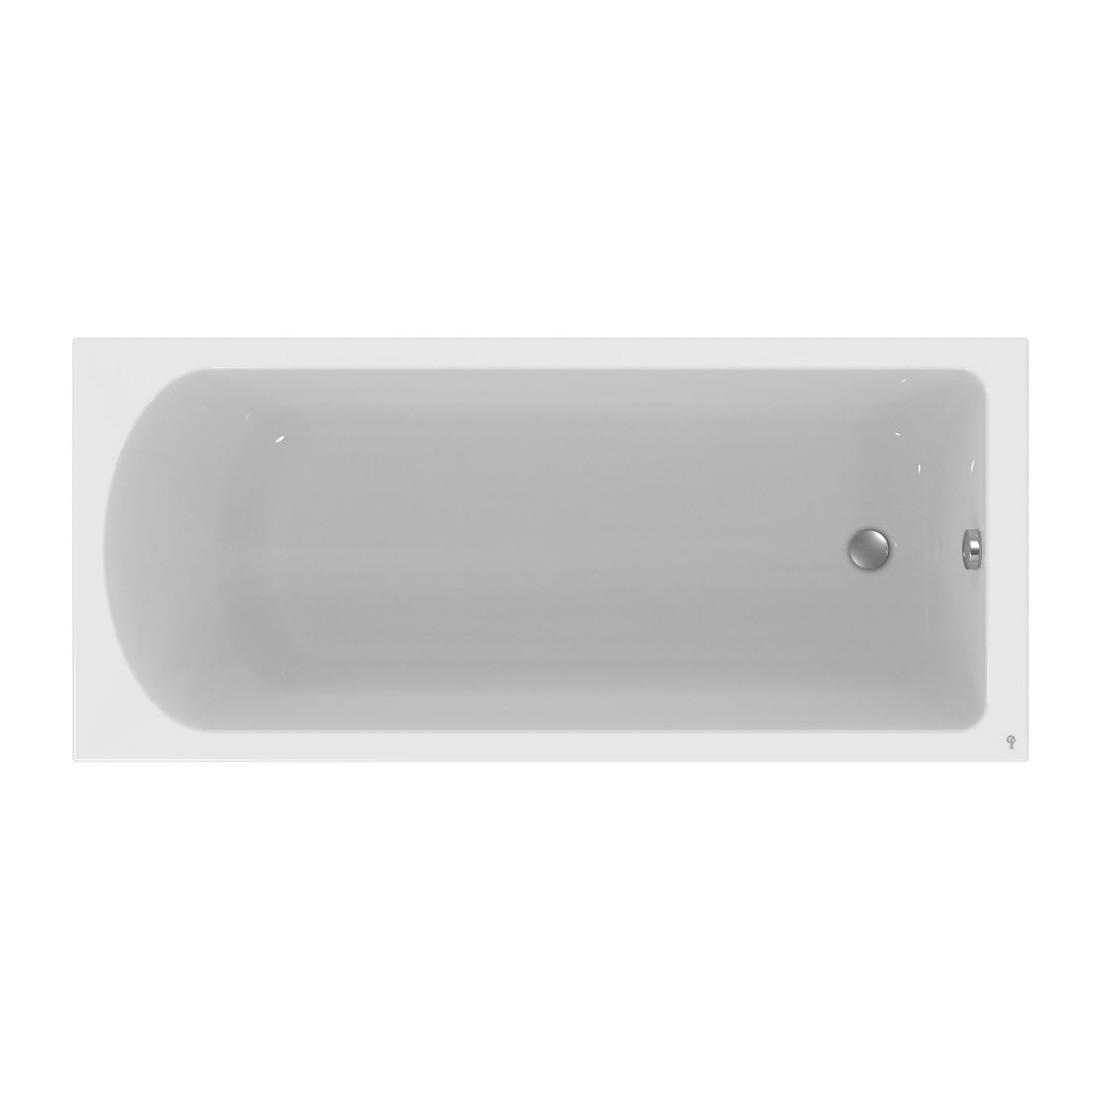 Akrilo vonia Ideal Standard, Hotline, 180x80, įmontuojama